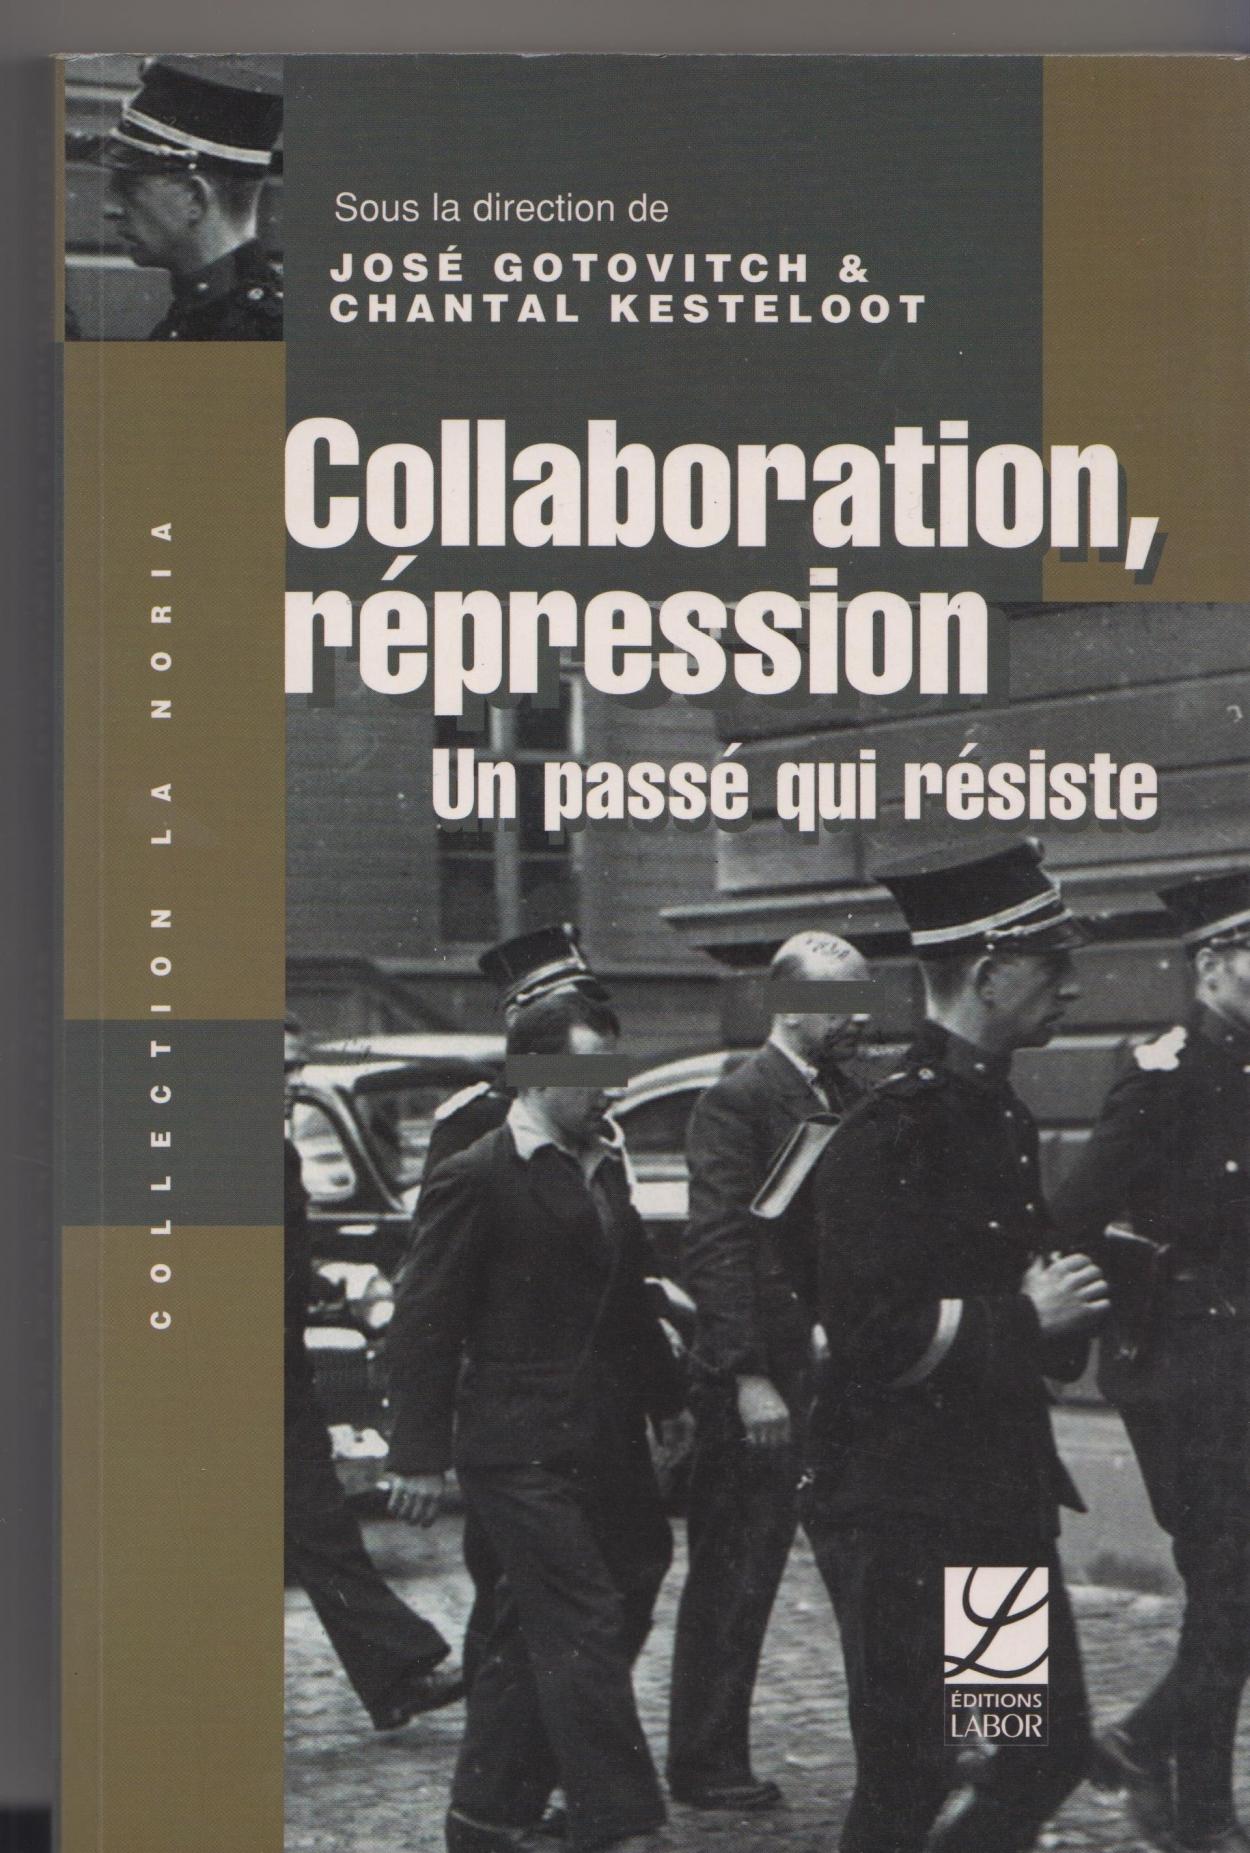 gotovitch-et-kesteloot_collaboration-rApression